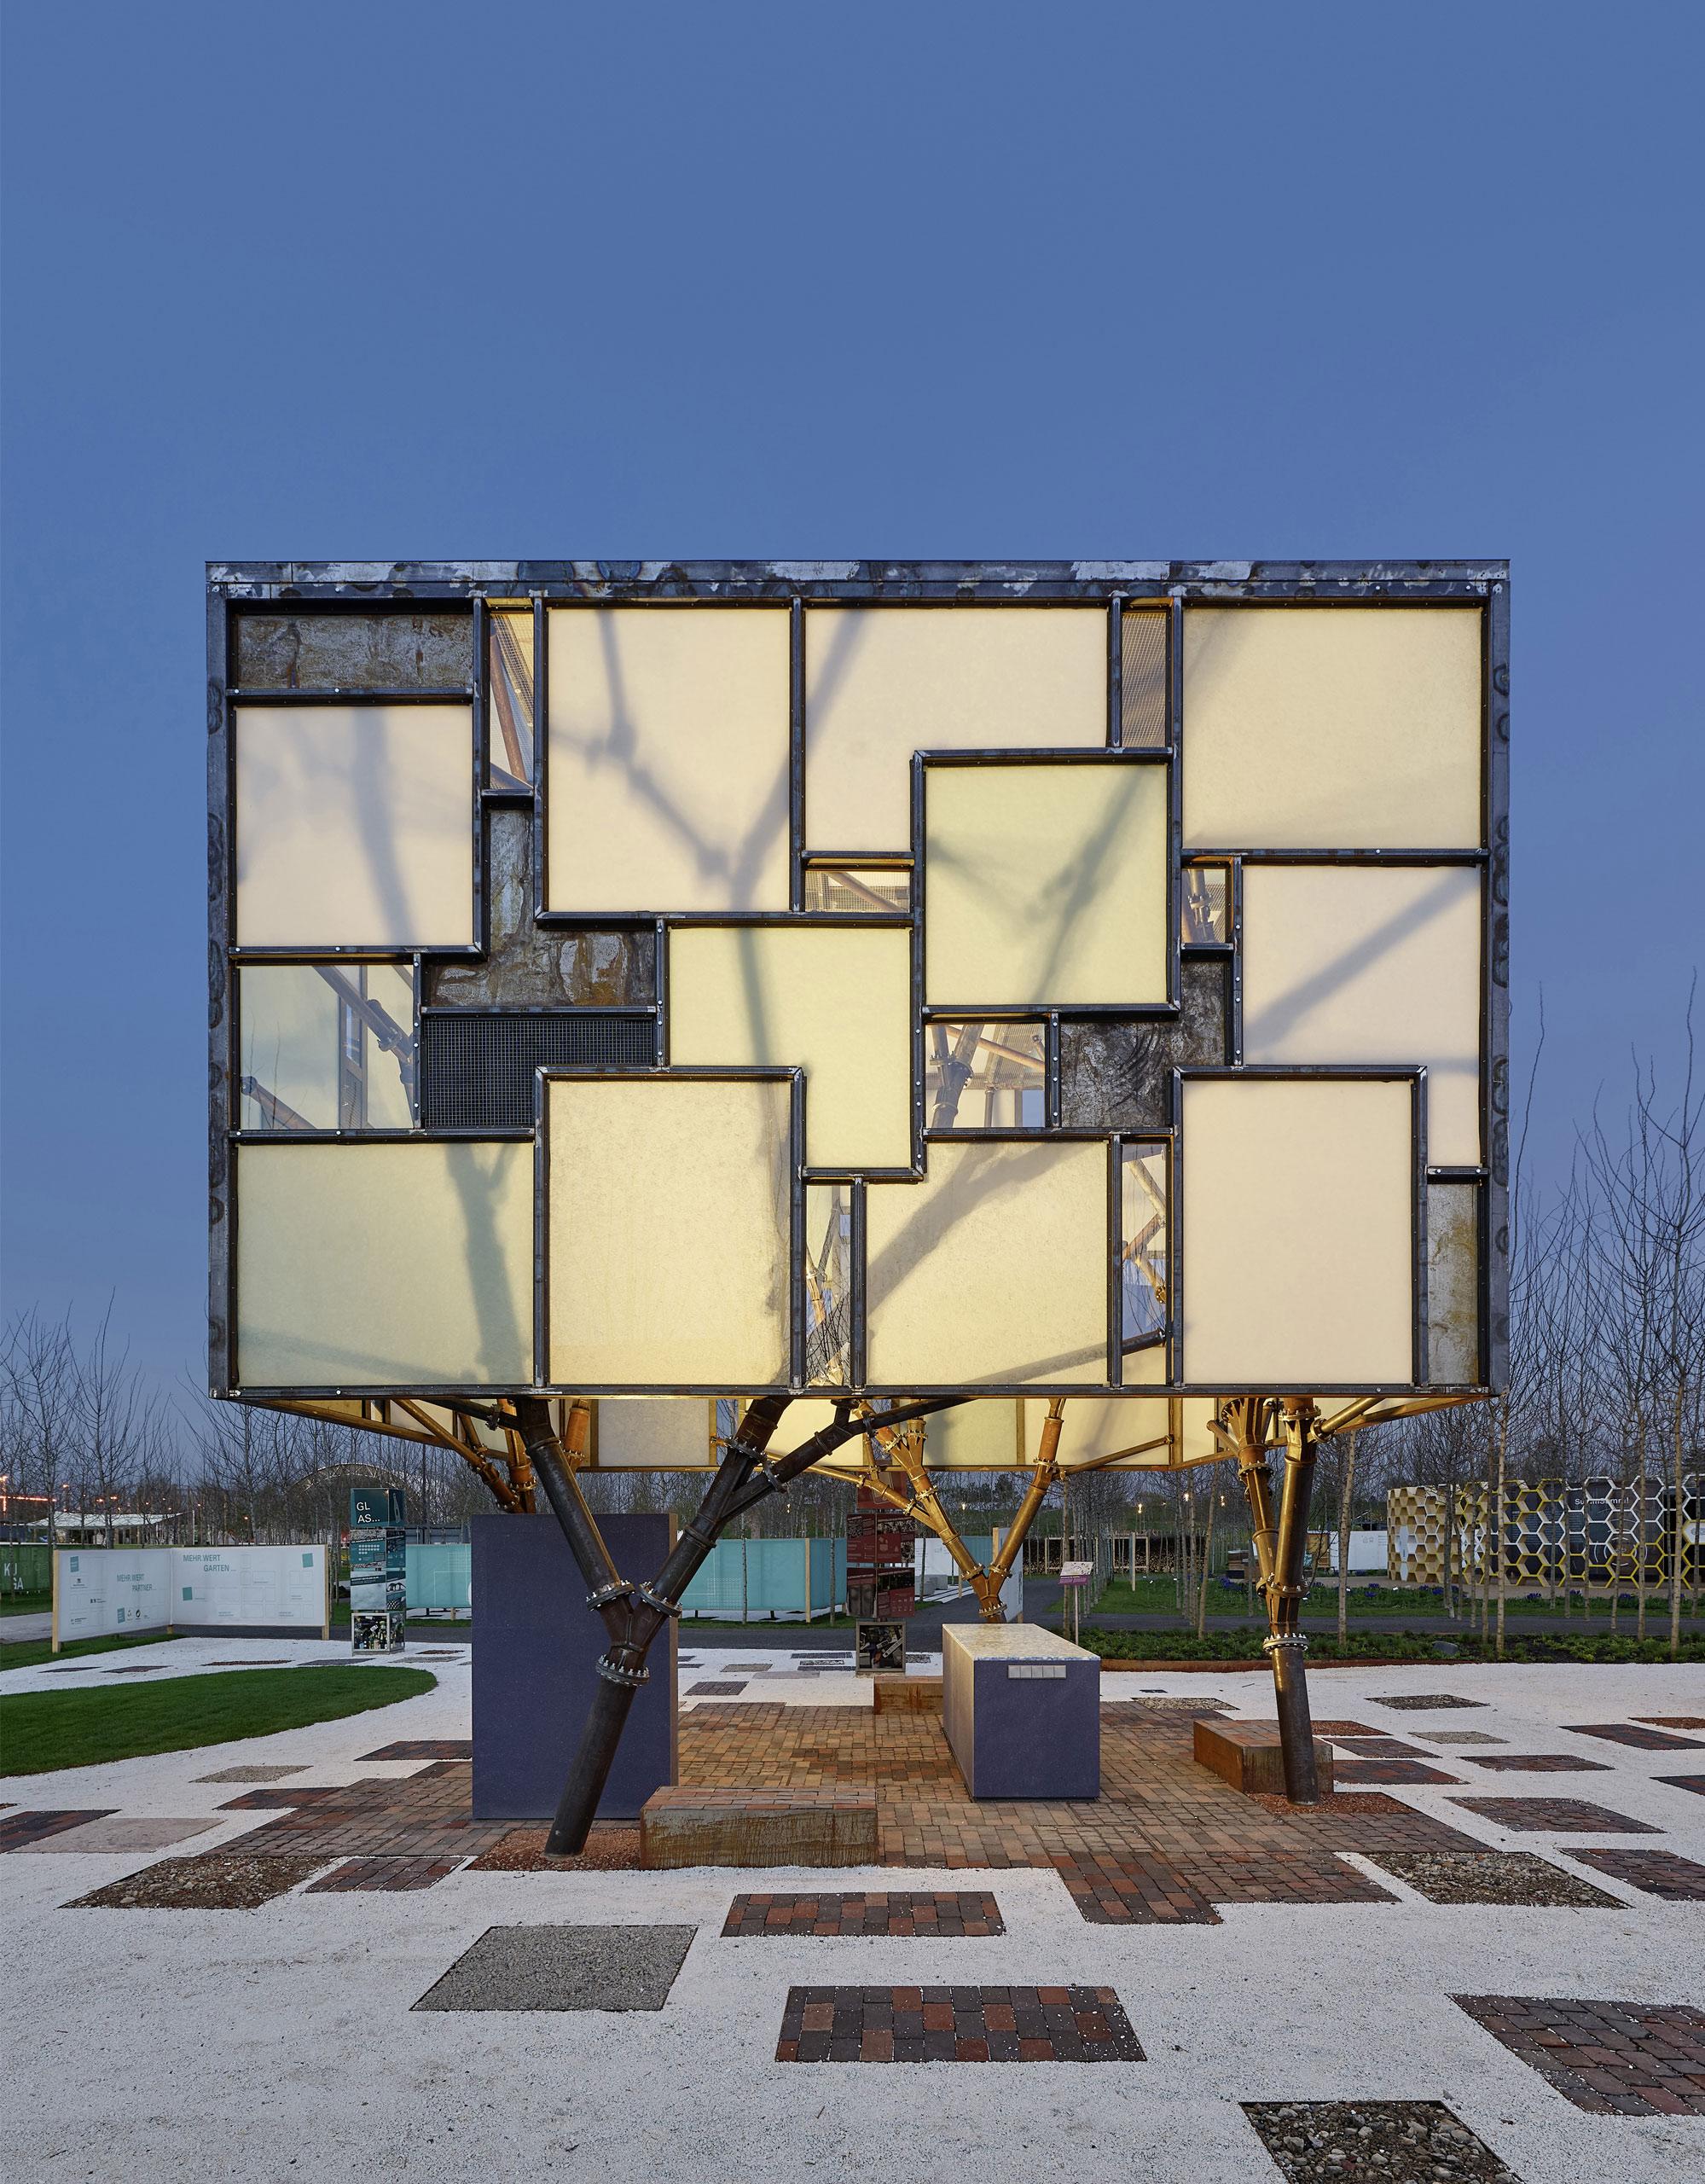 MAGNA Glaskeramik as facade of the Mehr.WERT.Pavillon (Value.ADDED.Pavilion) © Zooey Braun